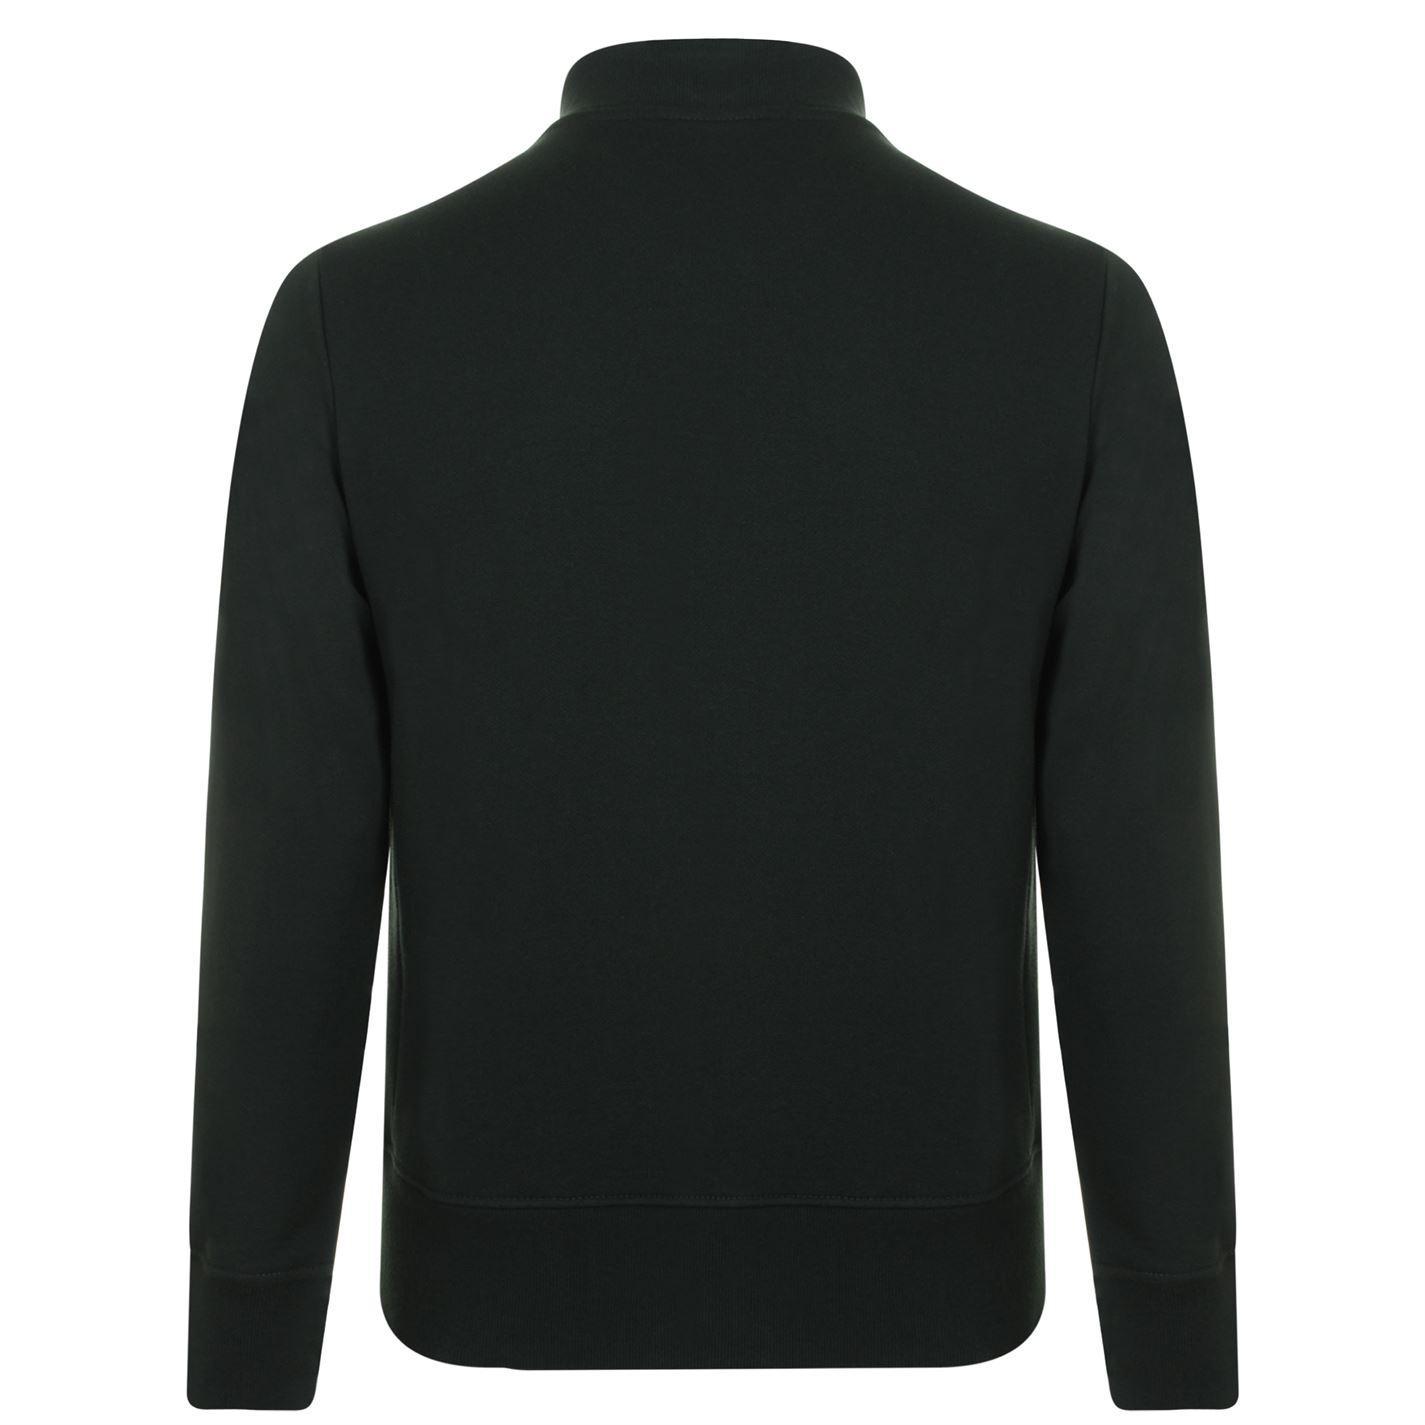 Paul Smith Cotton Baseball Jacket in Khaki (Black) for Men